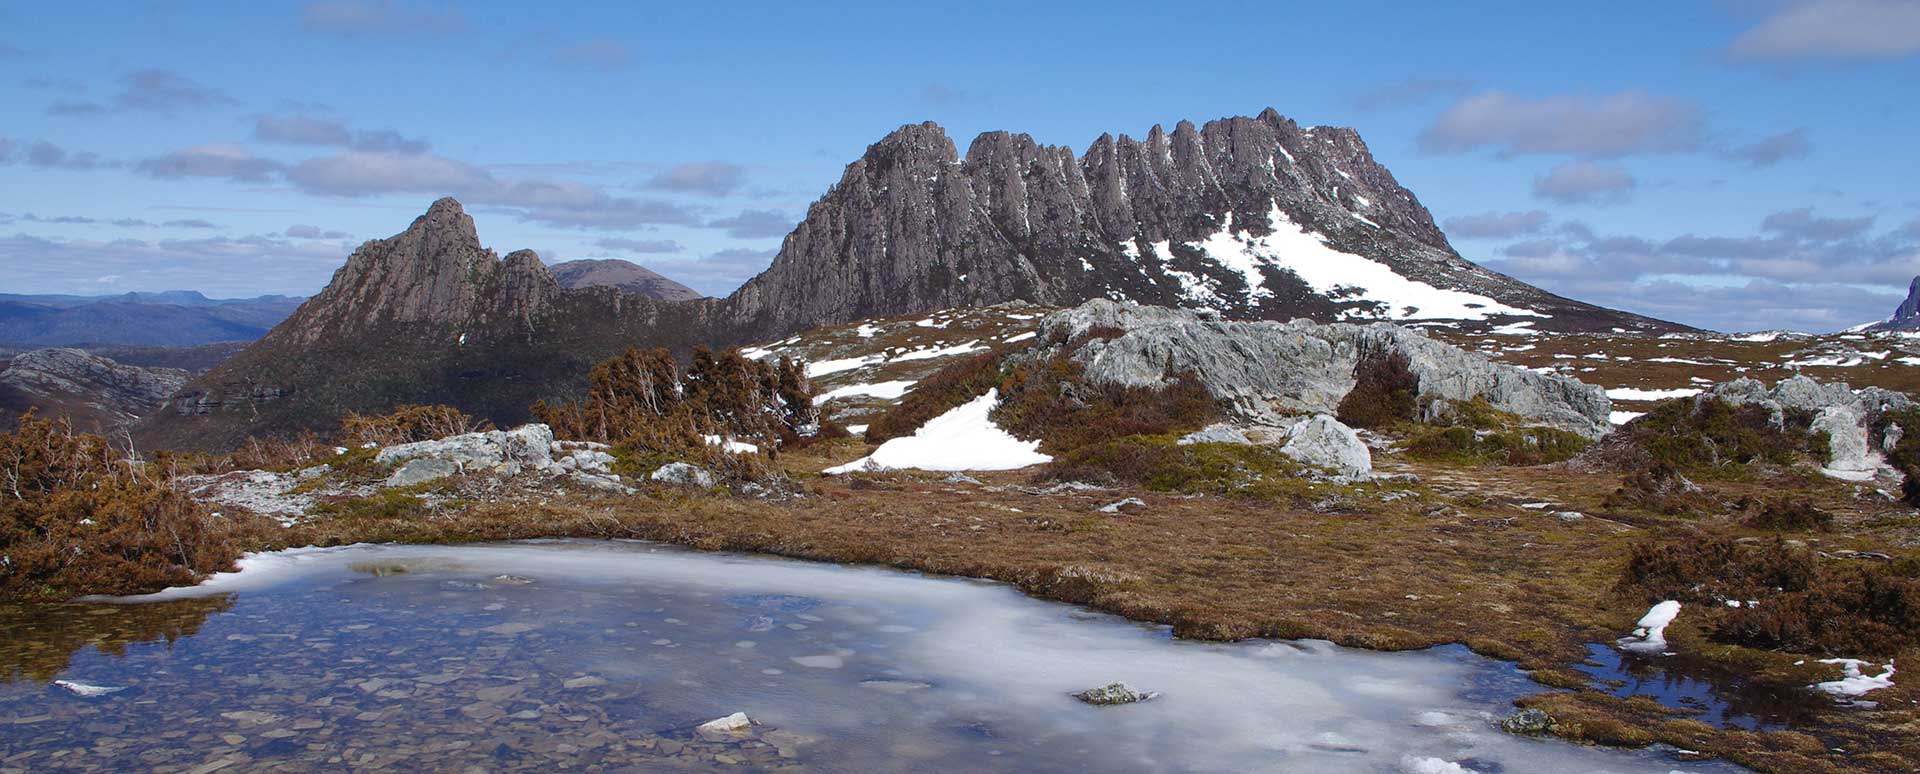 Image of cradle mountain in Tasmania